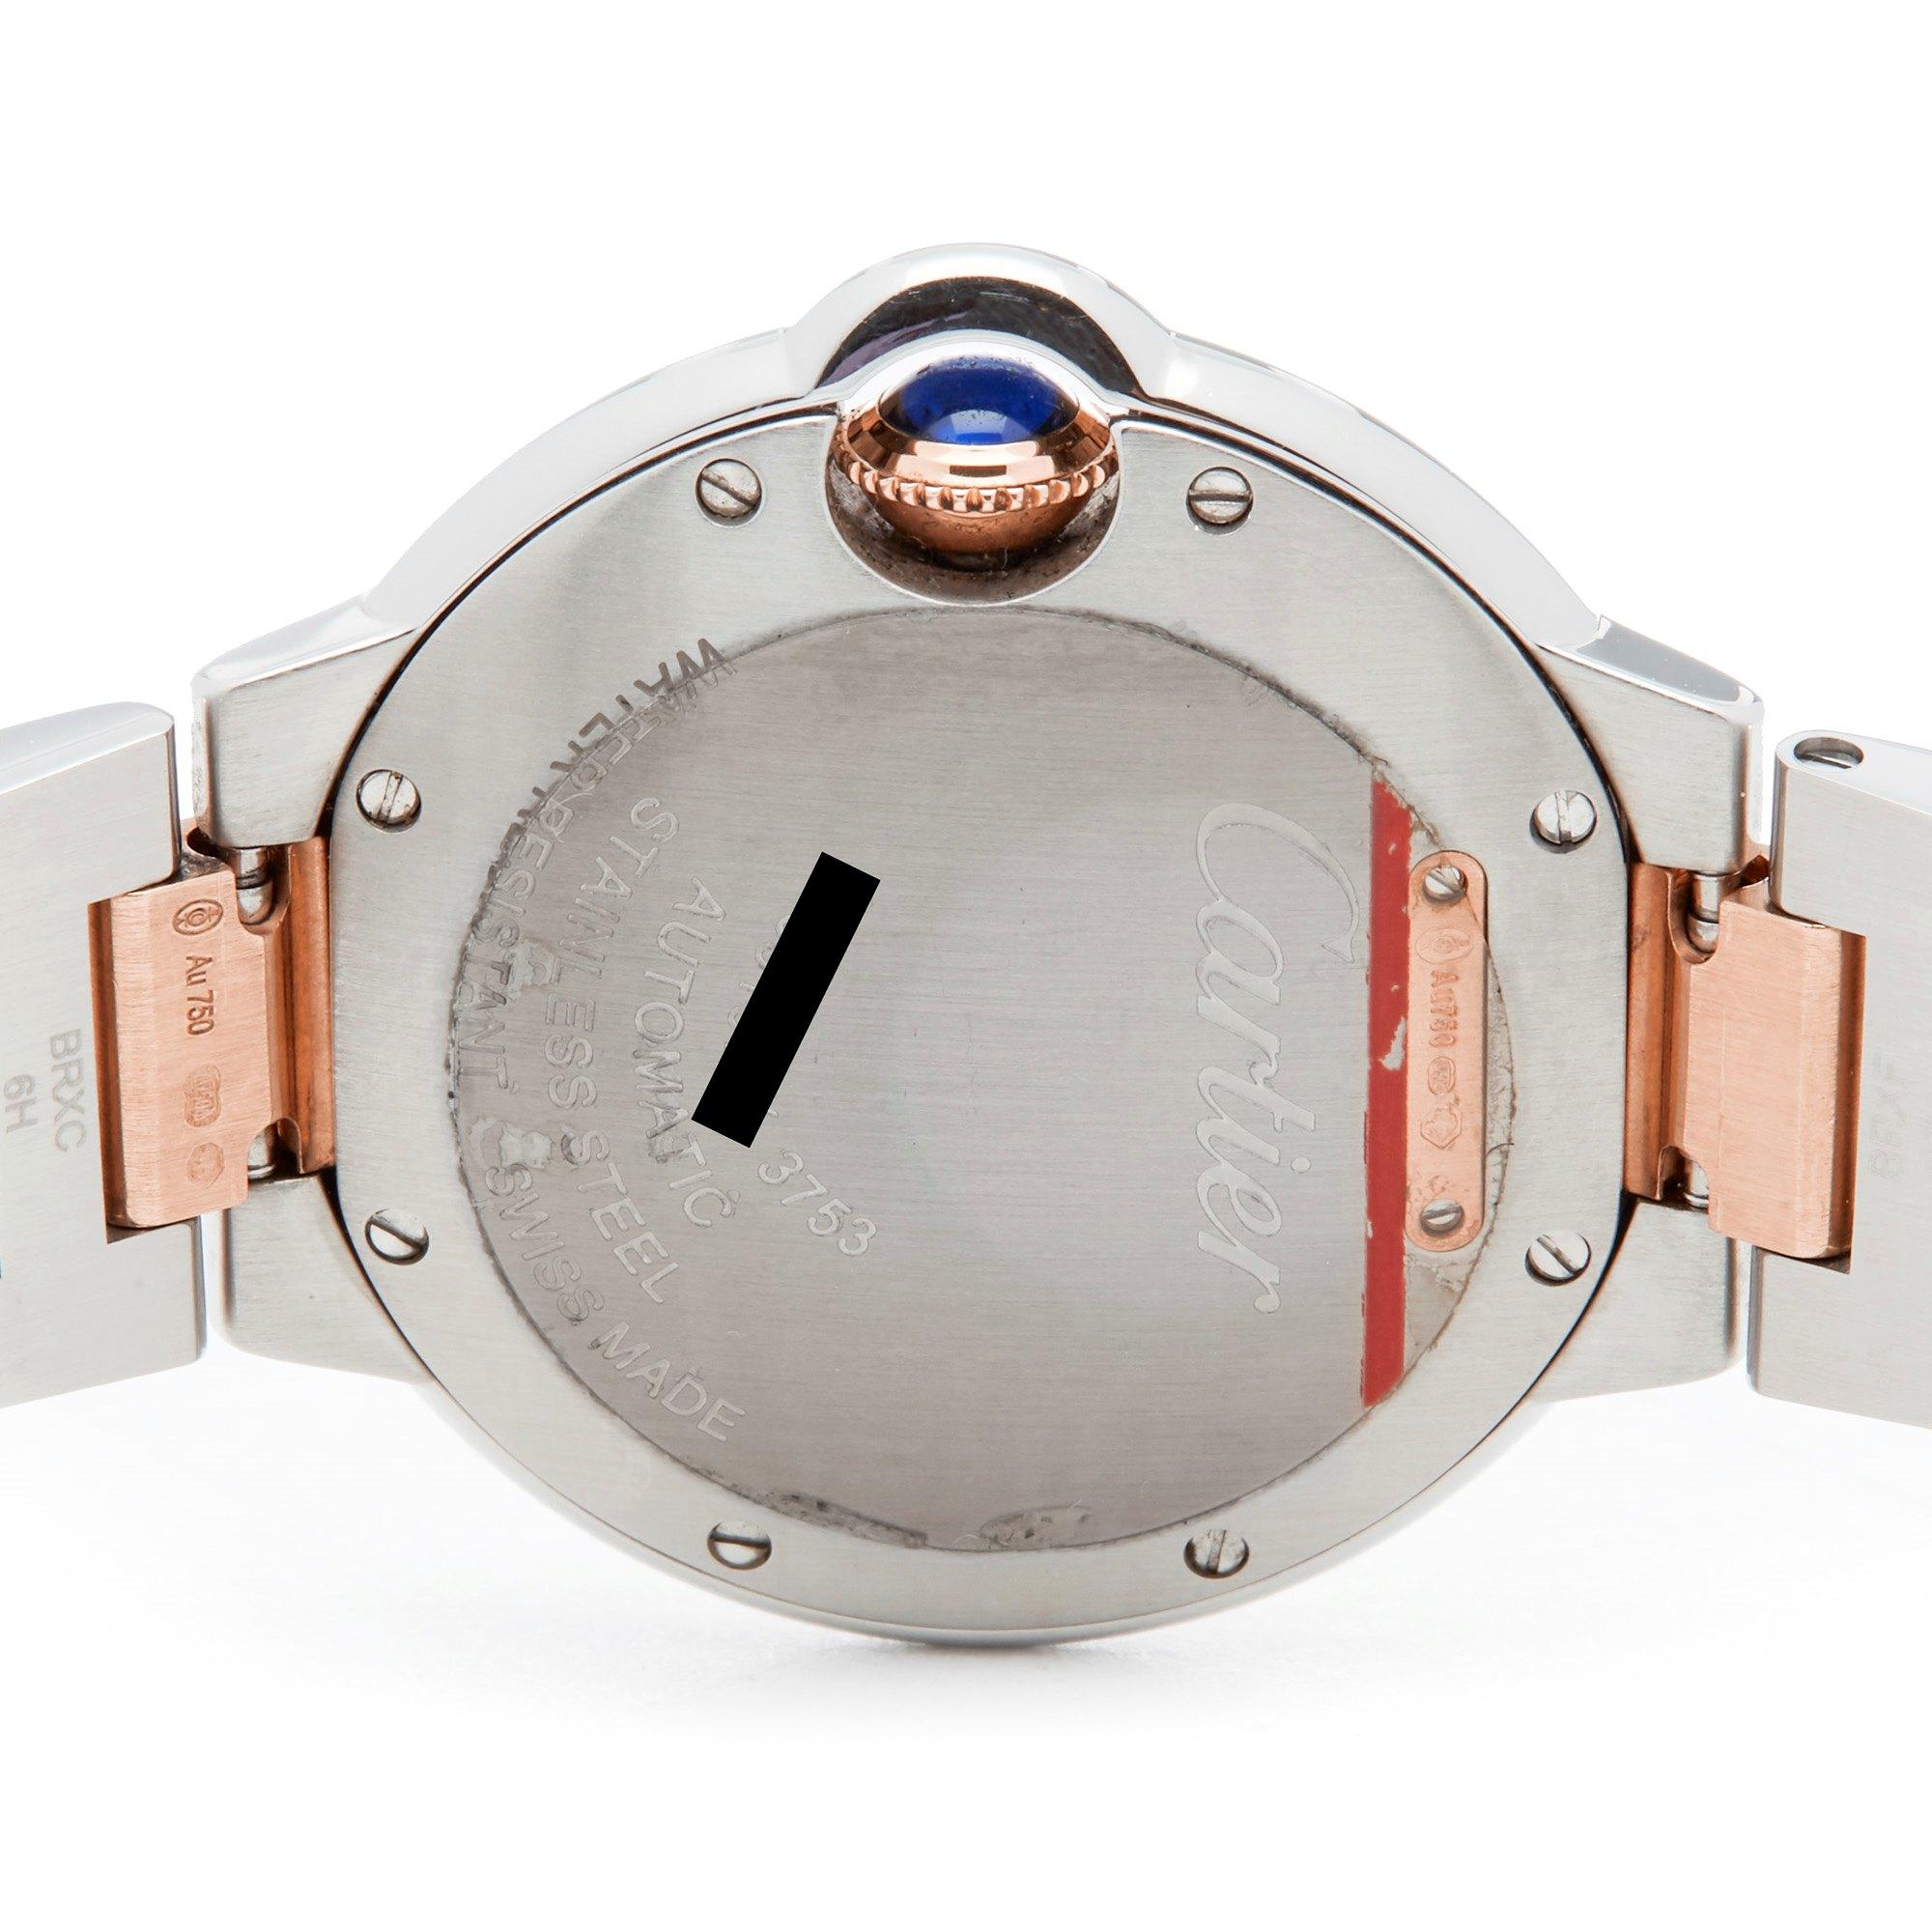 Lot 18 - Cartier Ballon Bleu 33 WE902077 or 3753 Ladies Stainless Steel & Rose Gold Diamond Watch